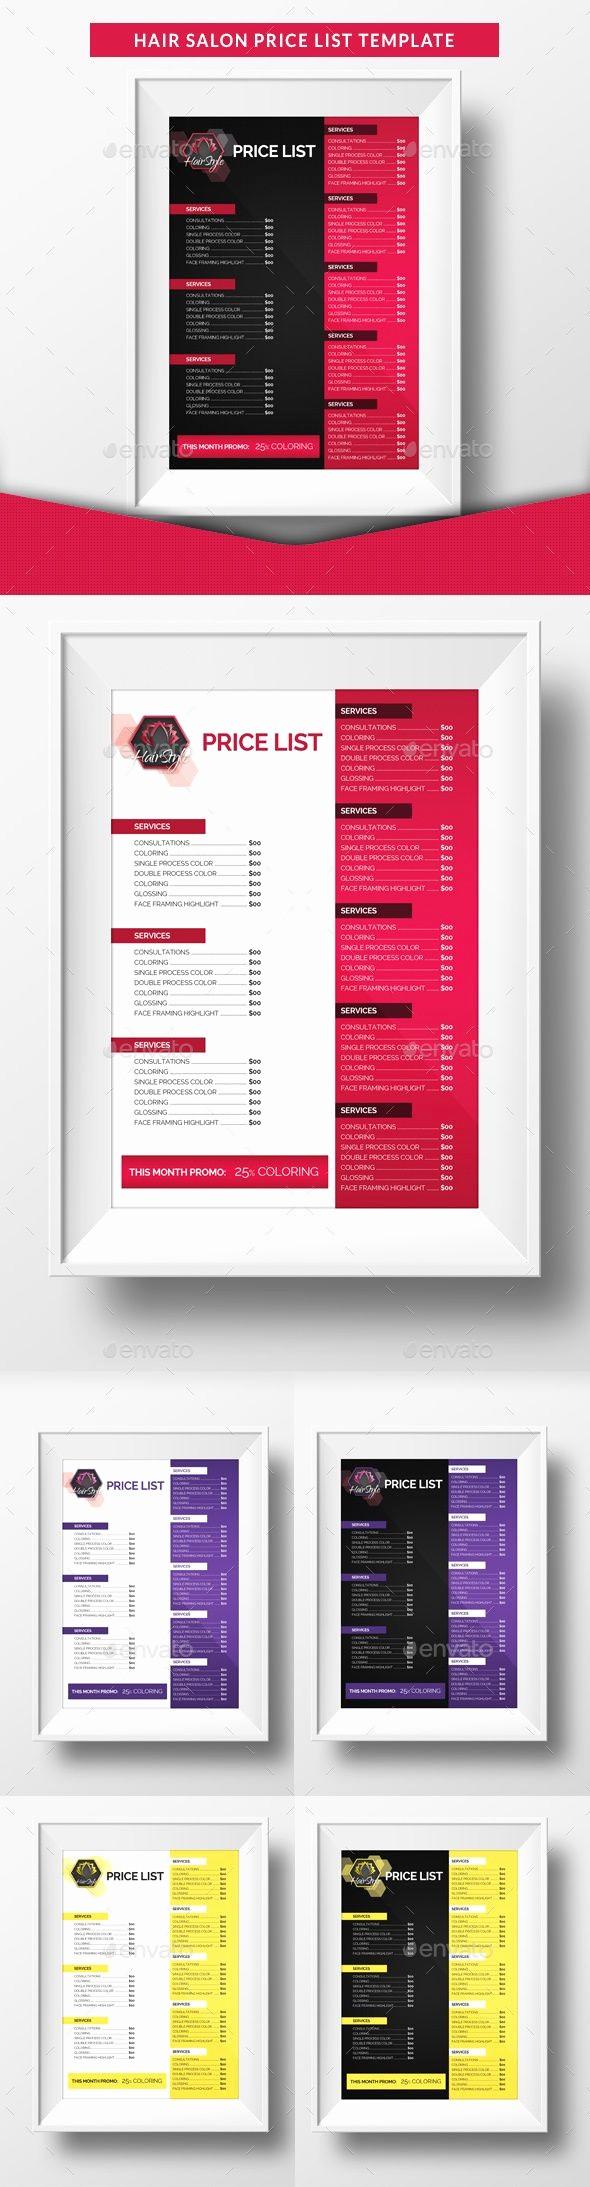 Create A Price List Template Elegant Hair Salon Price List Template